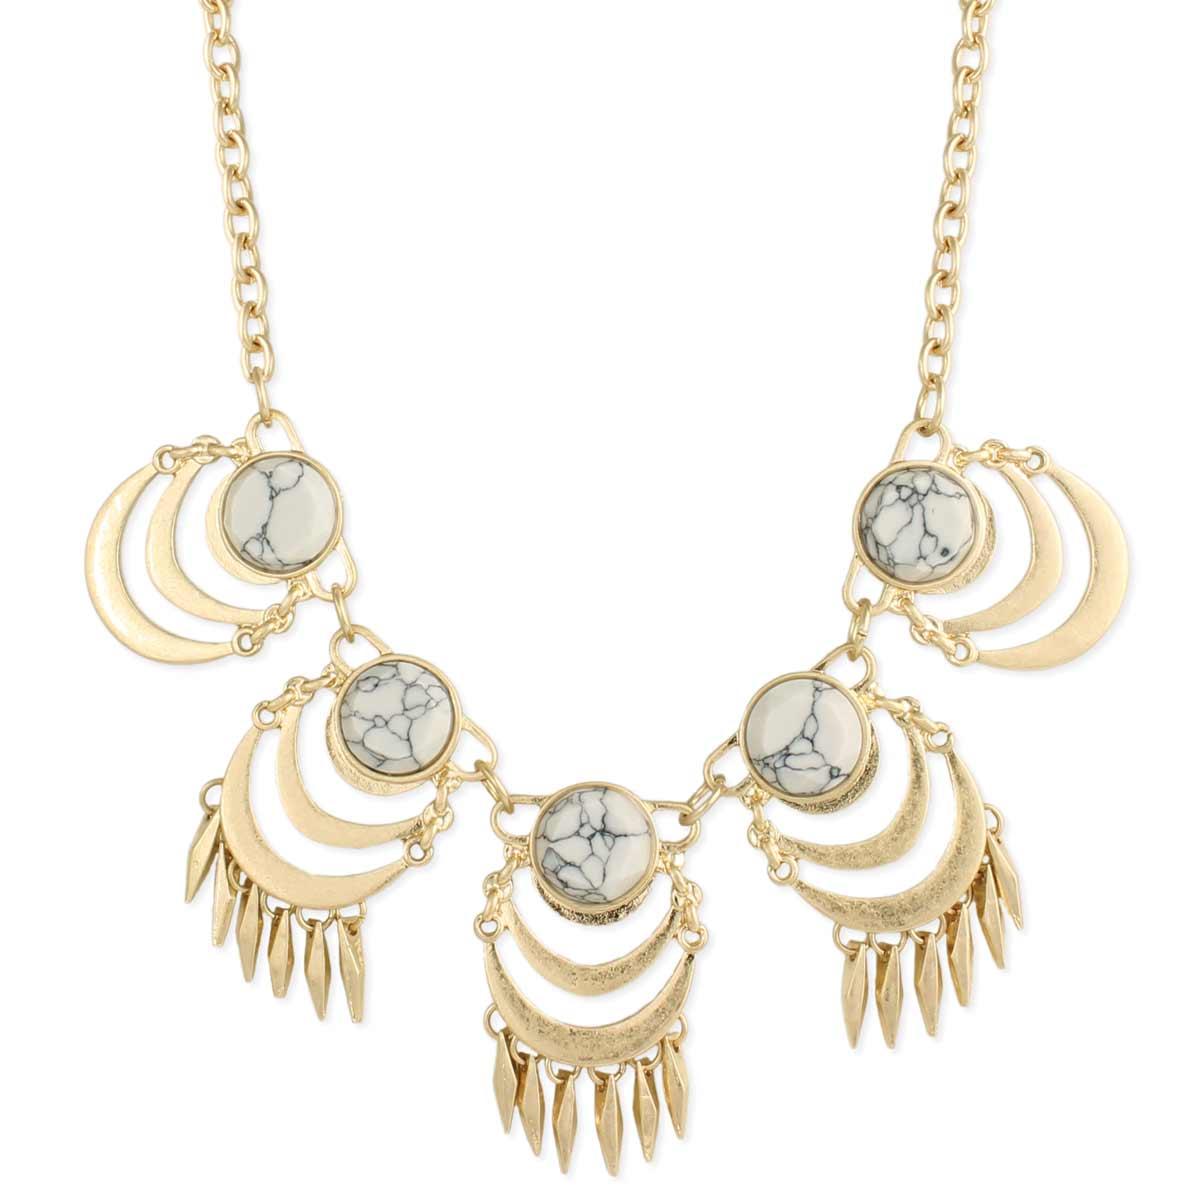 Gold & White Howlite Bib Necklace